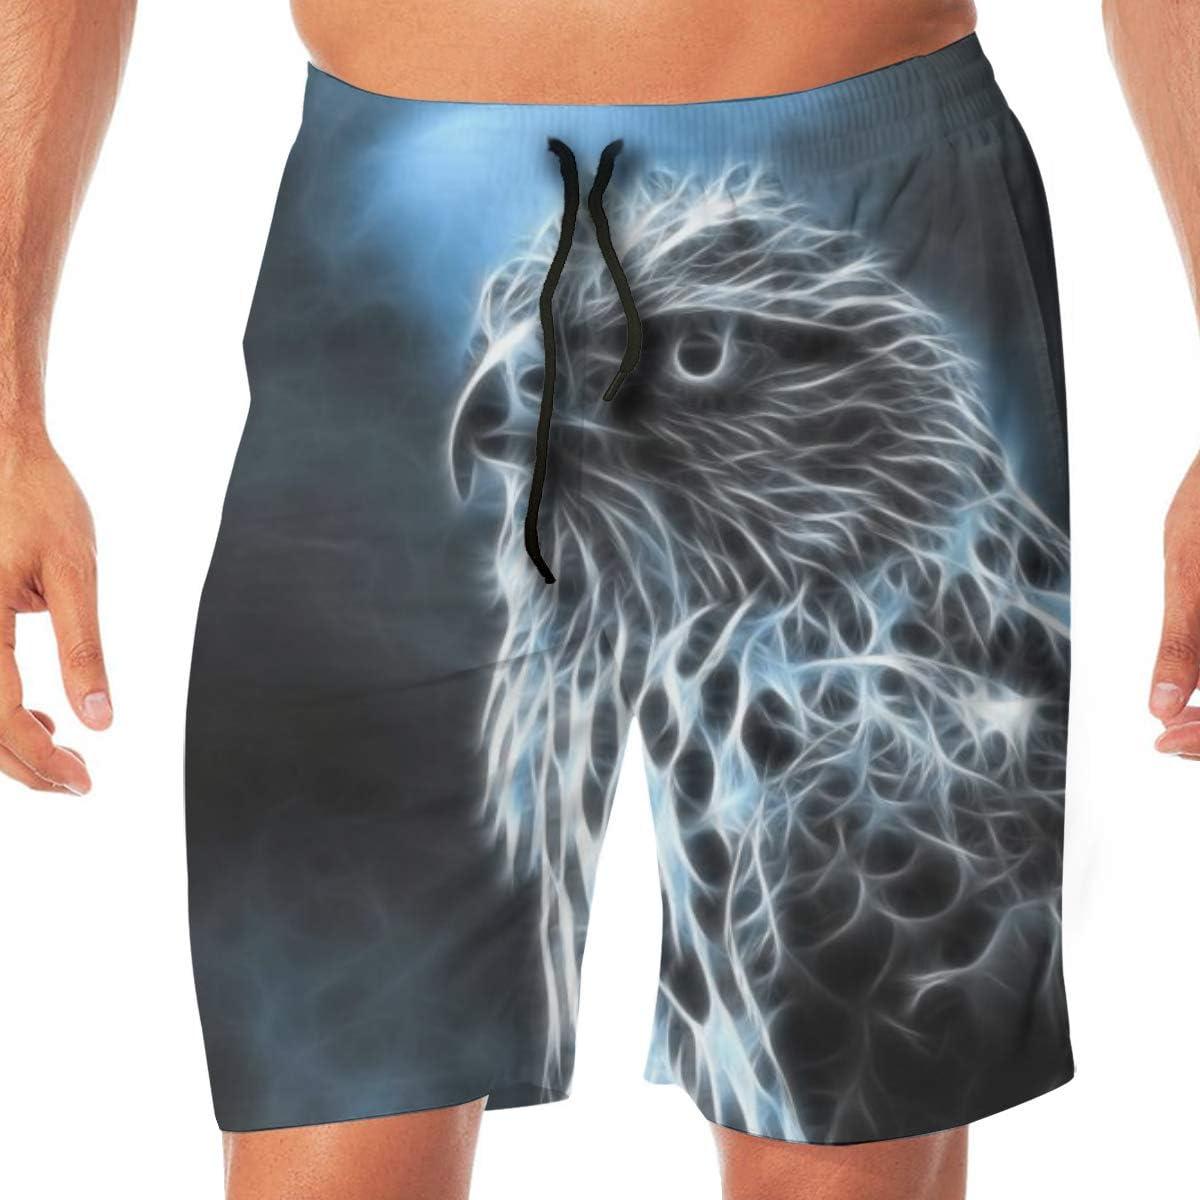 Animal Falcon Summer Mens Quick-Drying Swim Trunks Beach Shorts